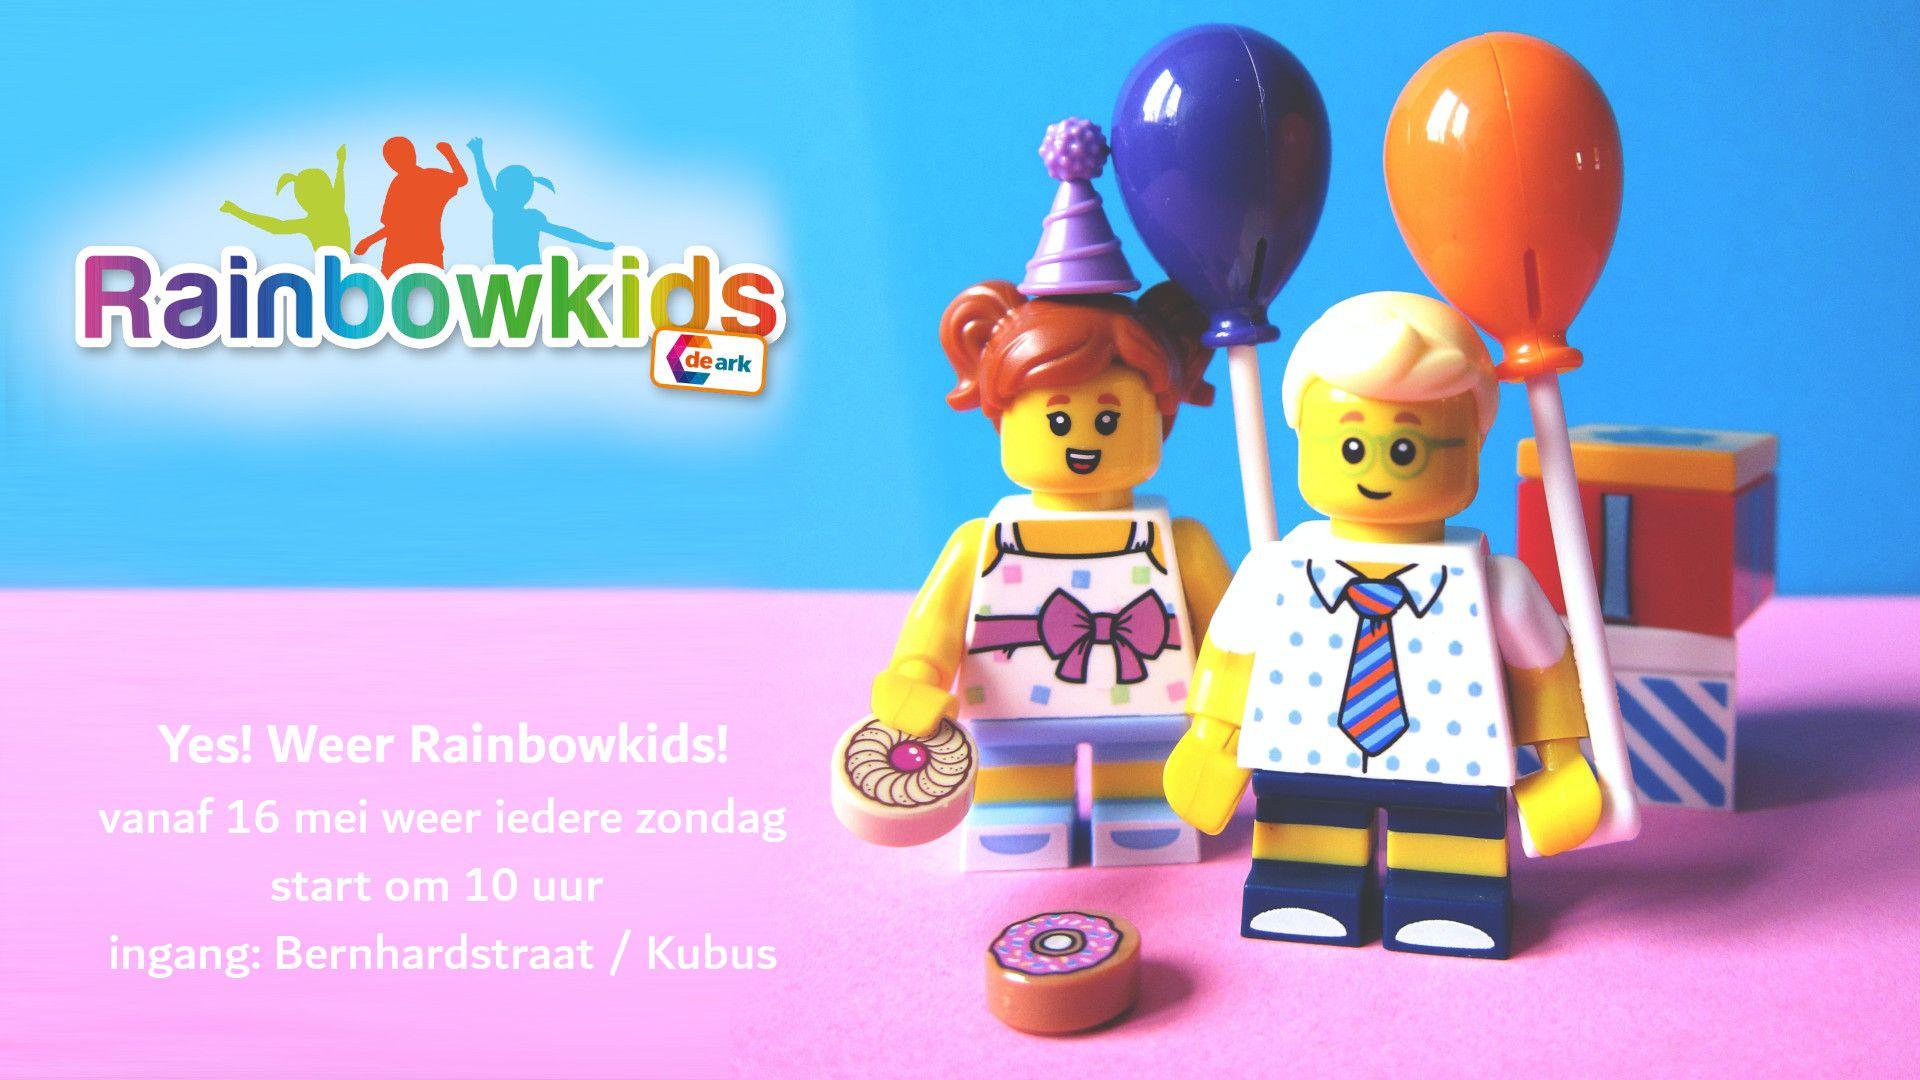 Rainbowkids